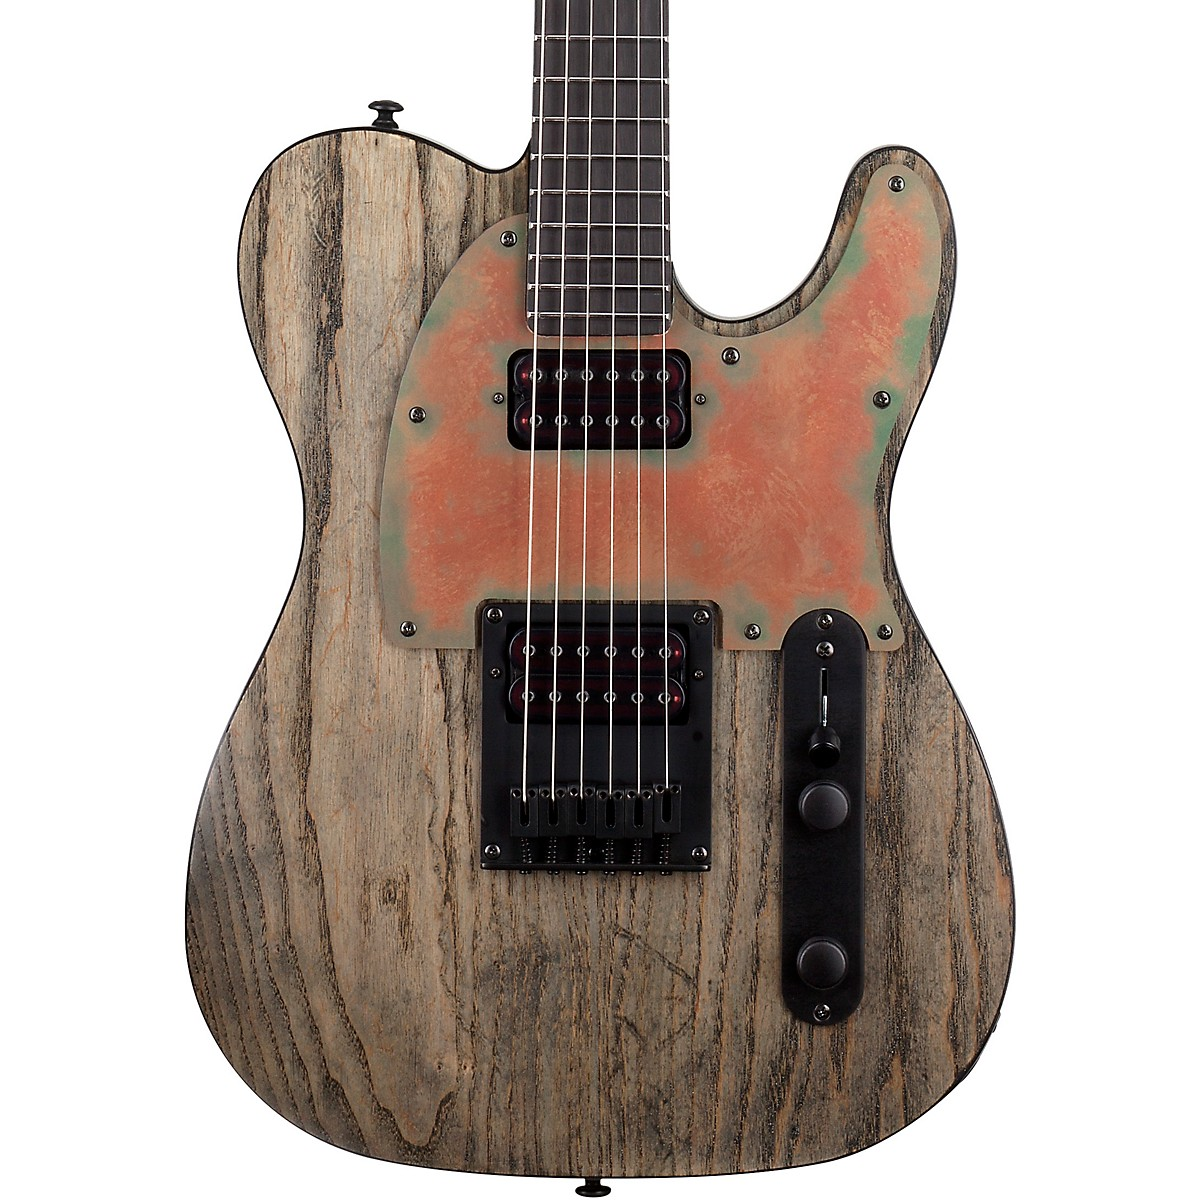 Schecter Guitar Research PT Apocalypse Electric Guitar